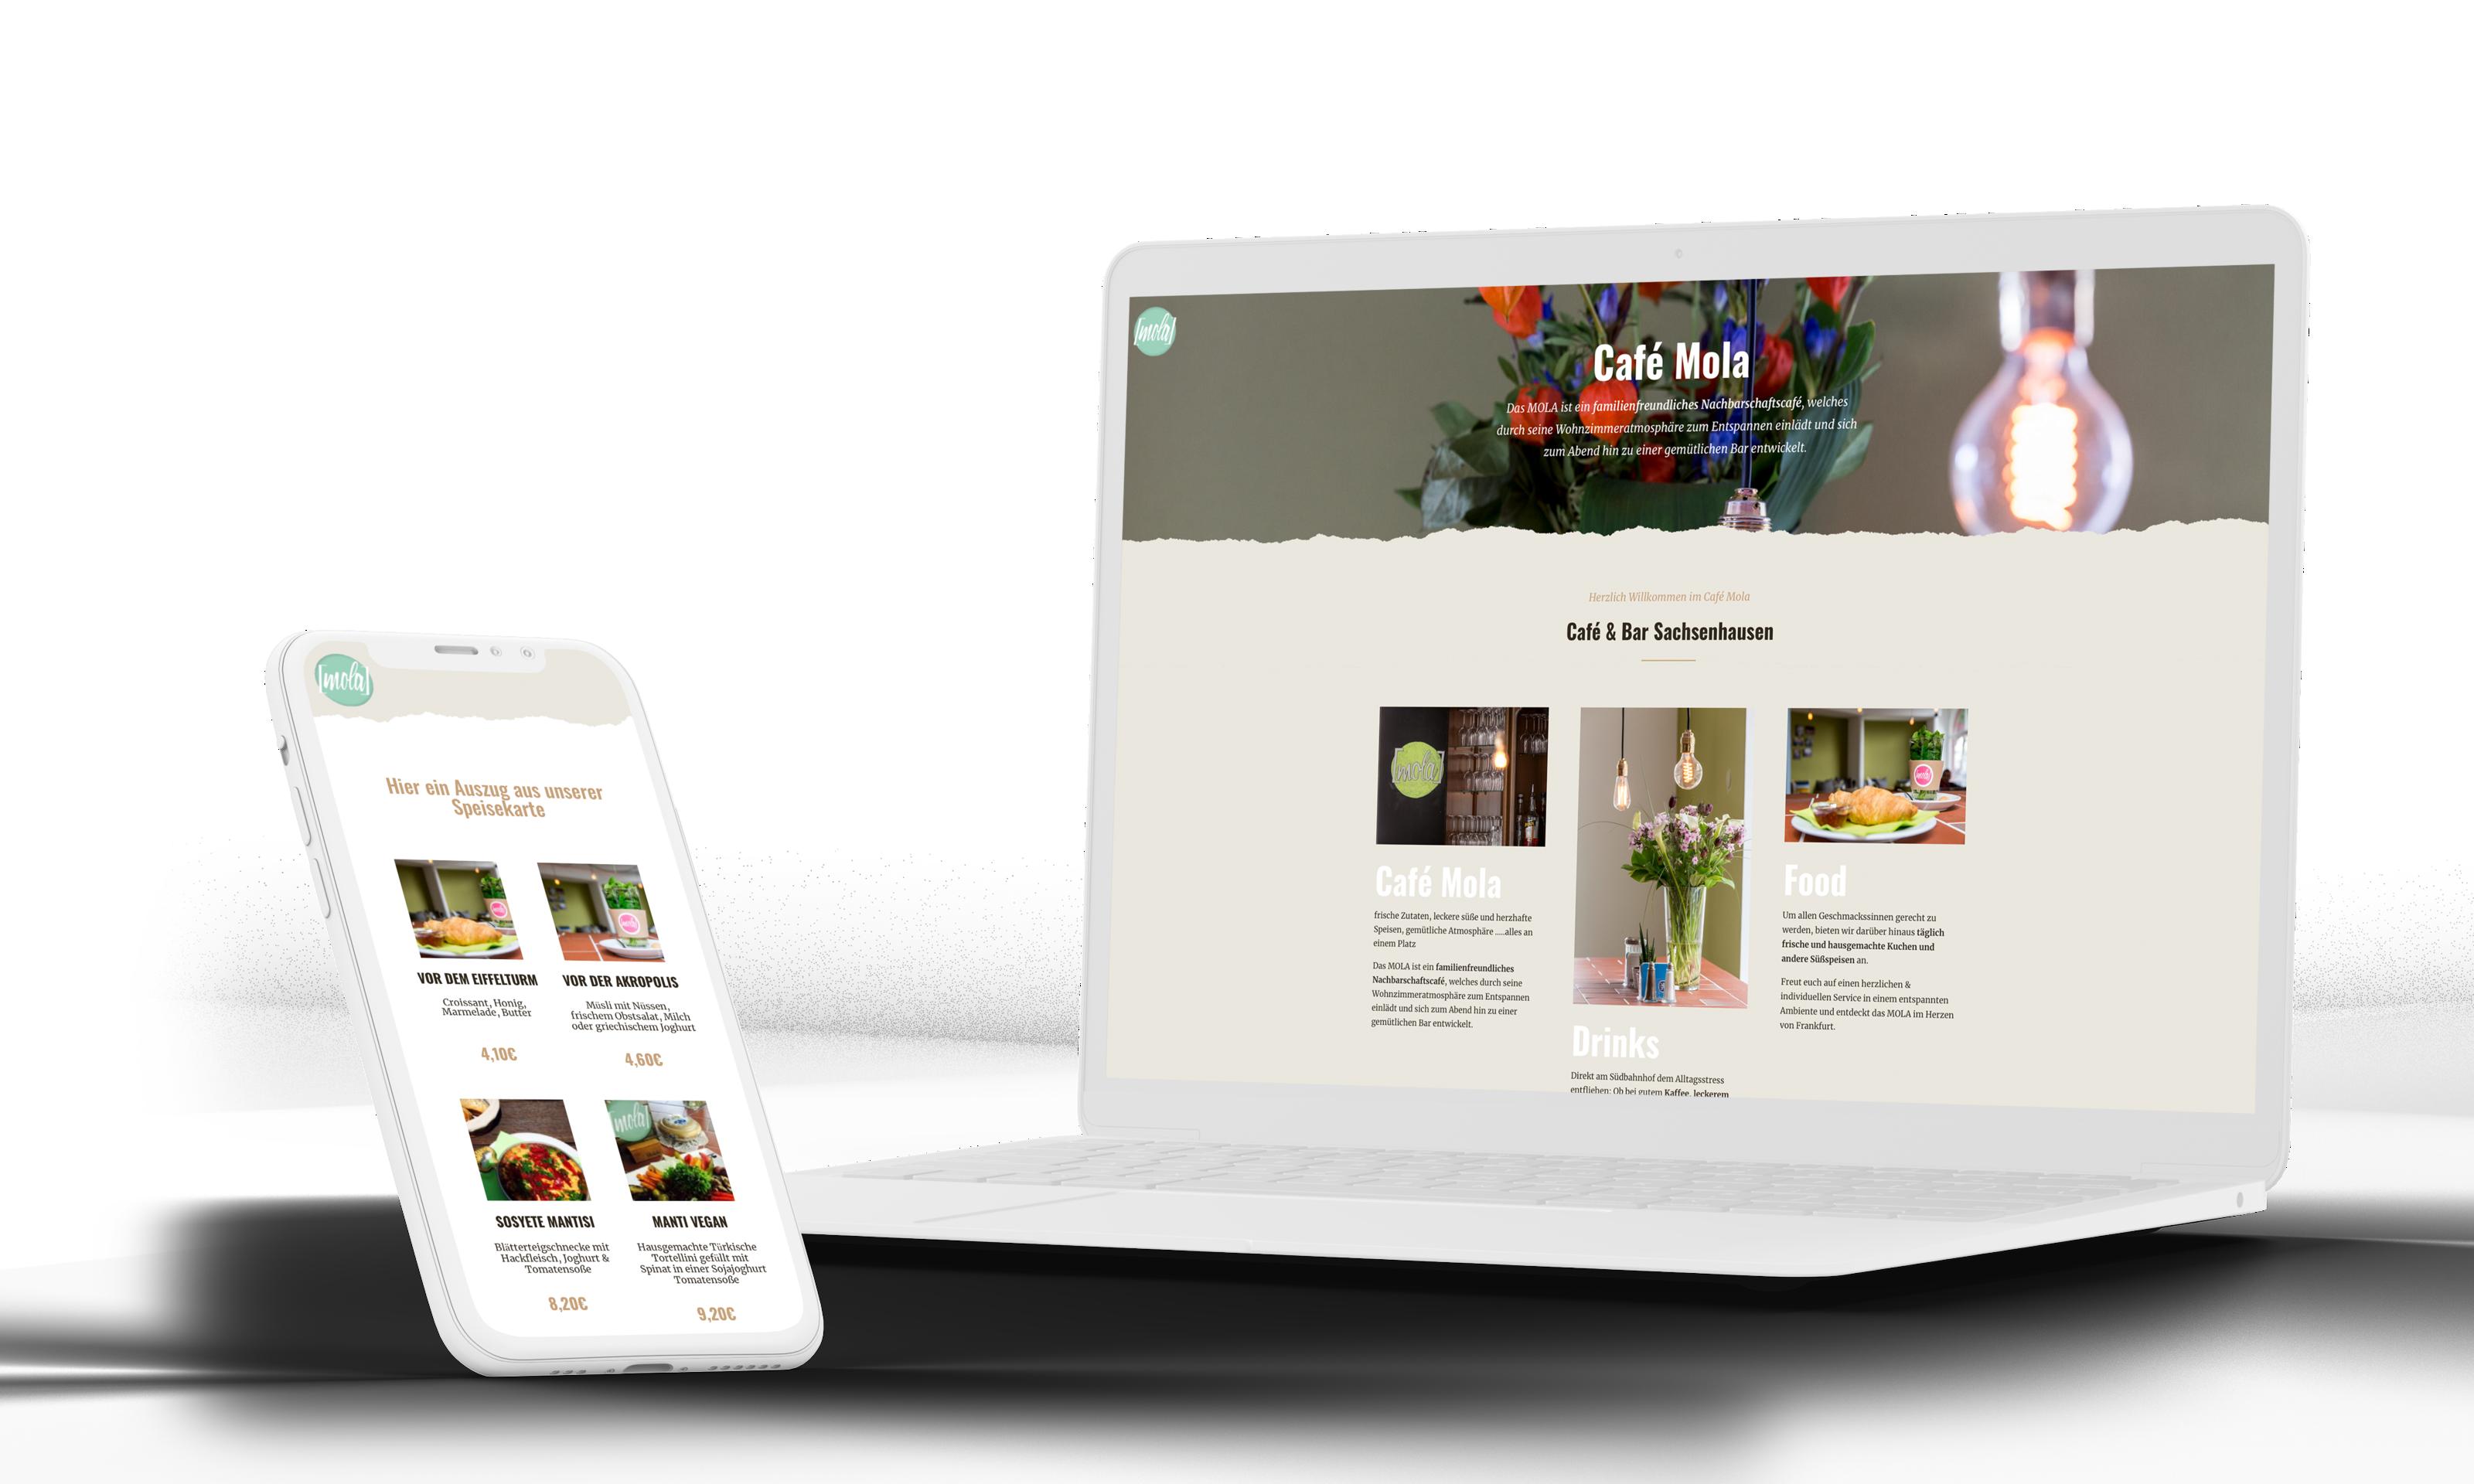 Cafe Mola Webdesign für Restaurant & Cafe